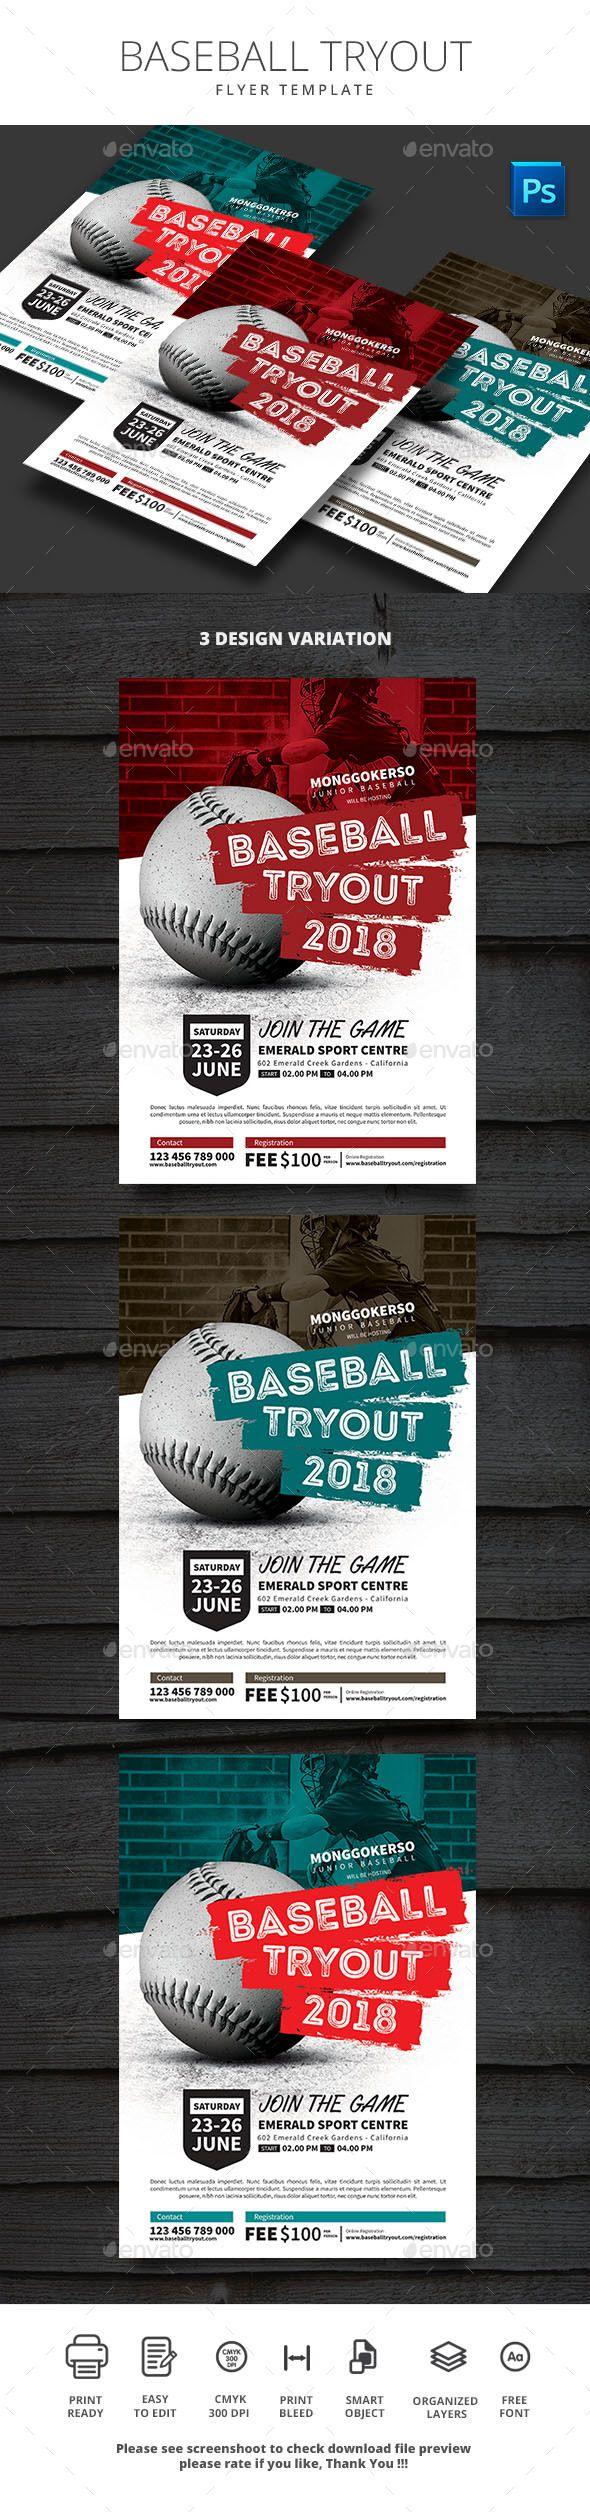 baseball tryouts flyer template psd flyer templates pinterest